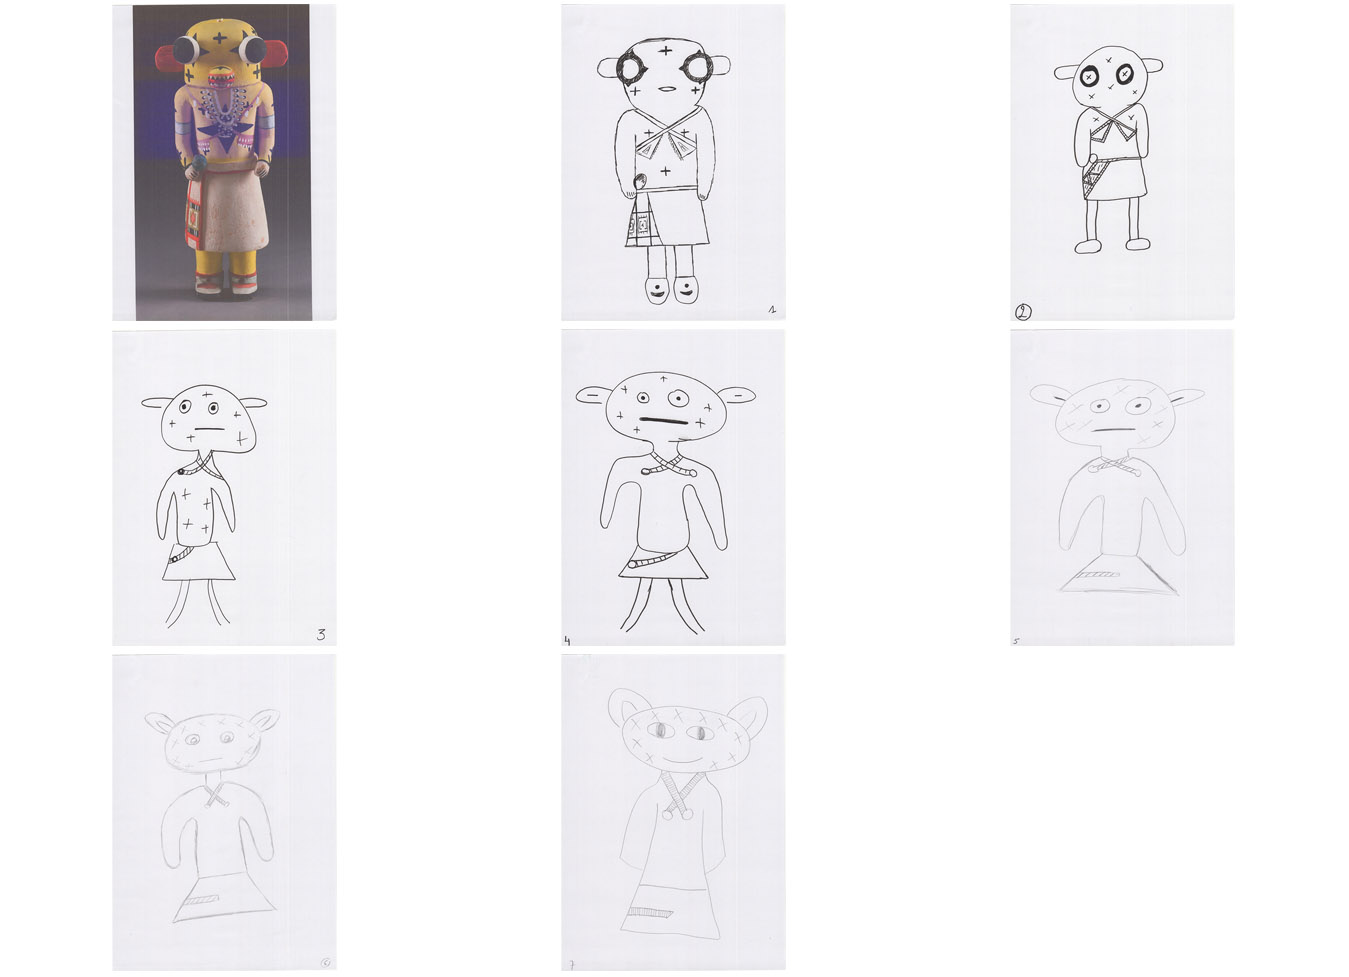 Series after an image of a Hopi Kachina figure